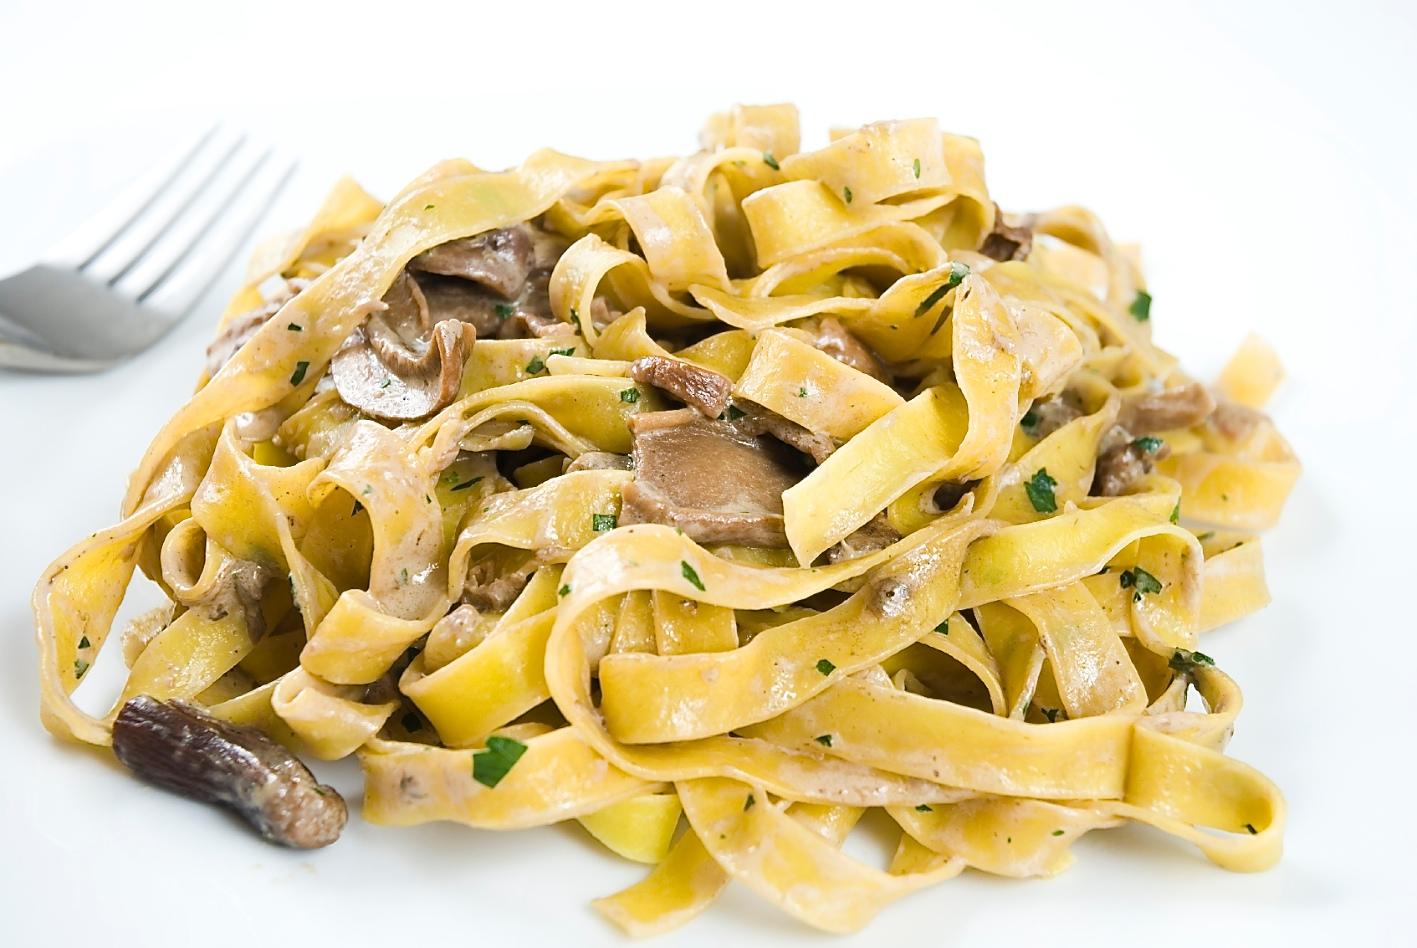 Pranzo sai cosa mangi edo blog - Cosa cucinare oggi a pranzo ...